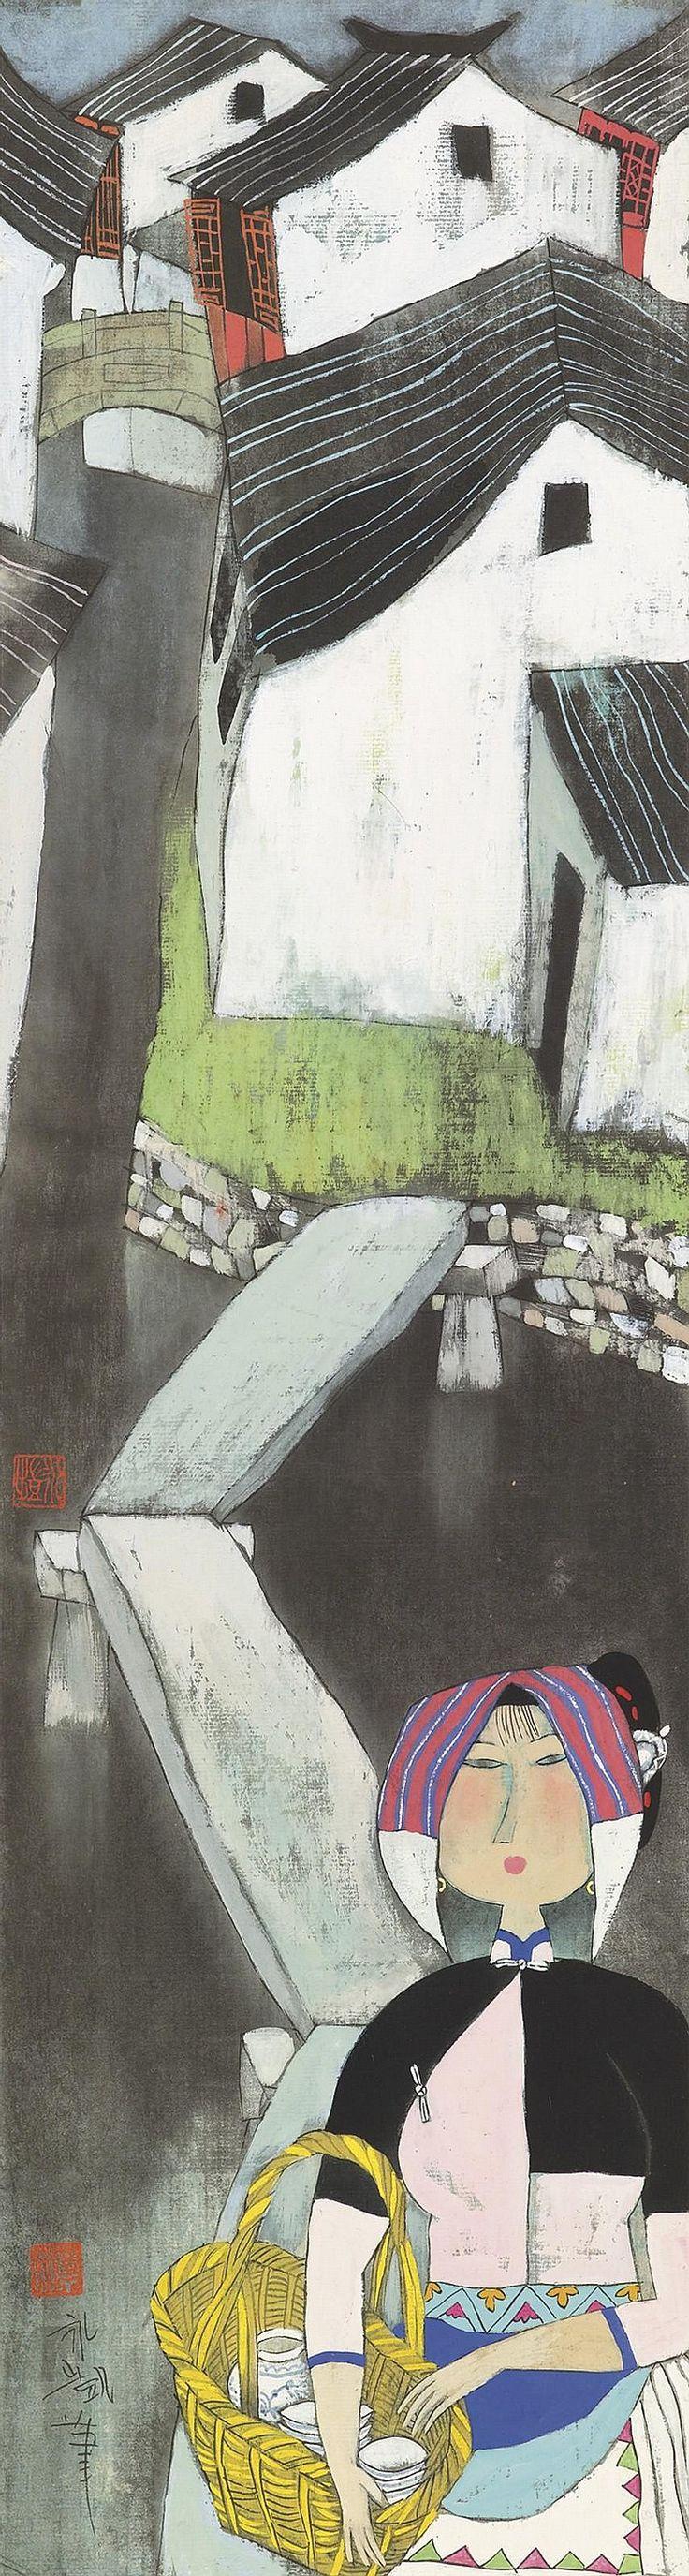 20paintings fishing jpg chinese peasant paintings pinterest - Yongkai Hu Works On Sale At Auction Biography